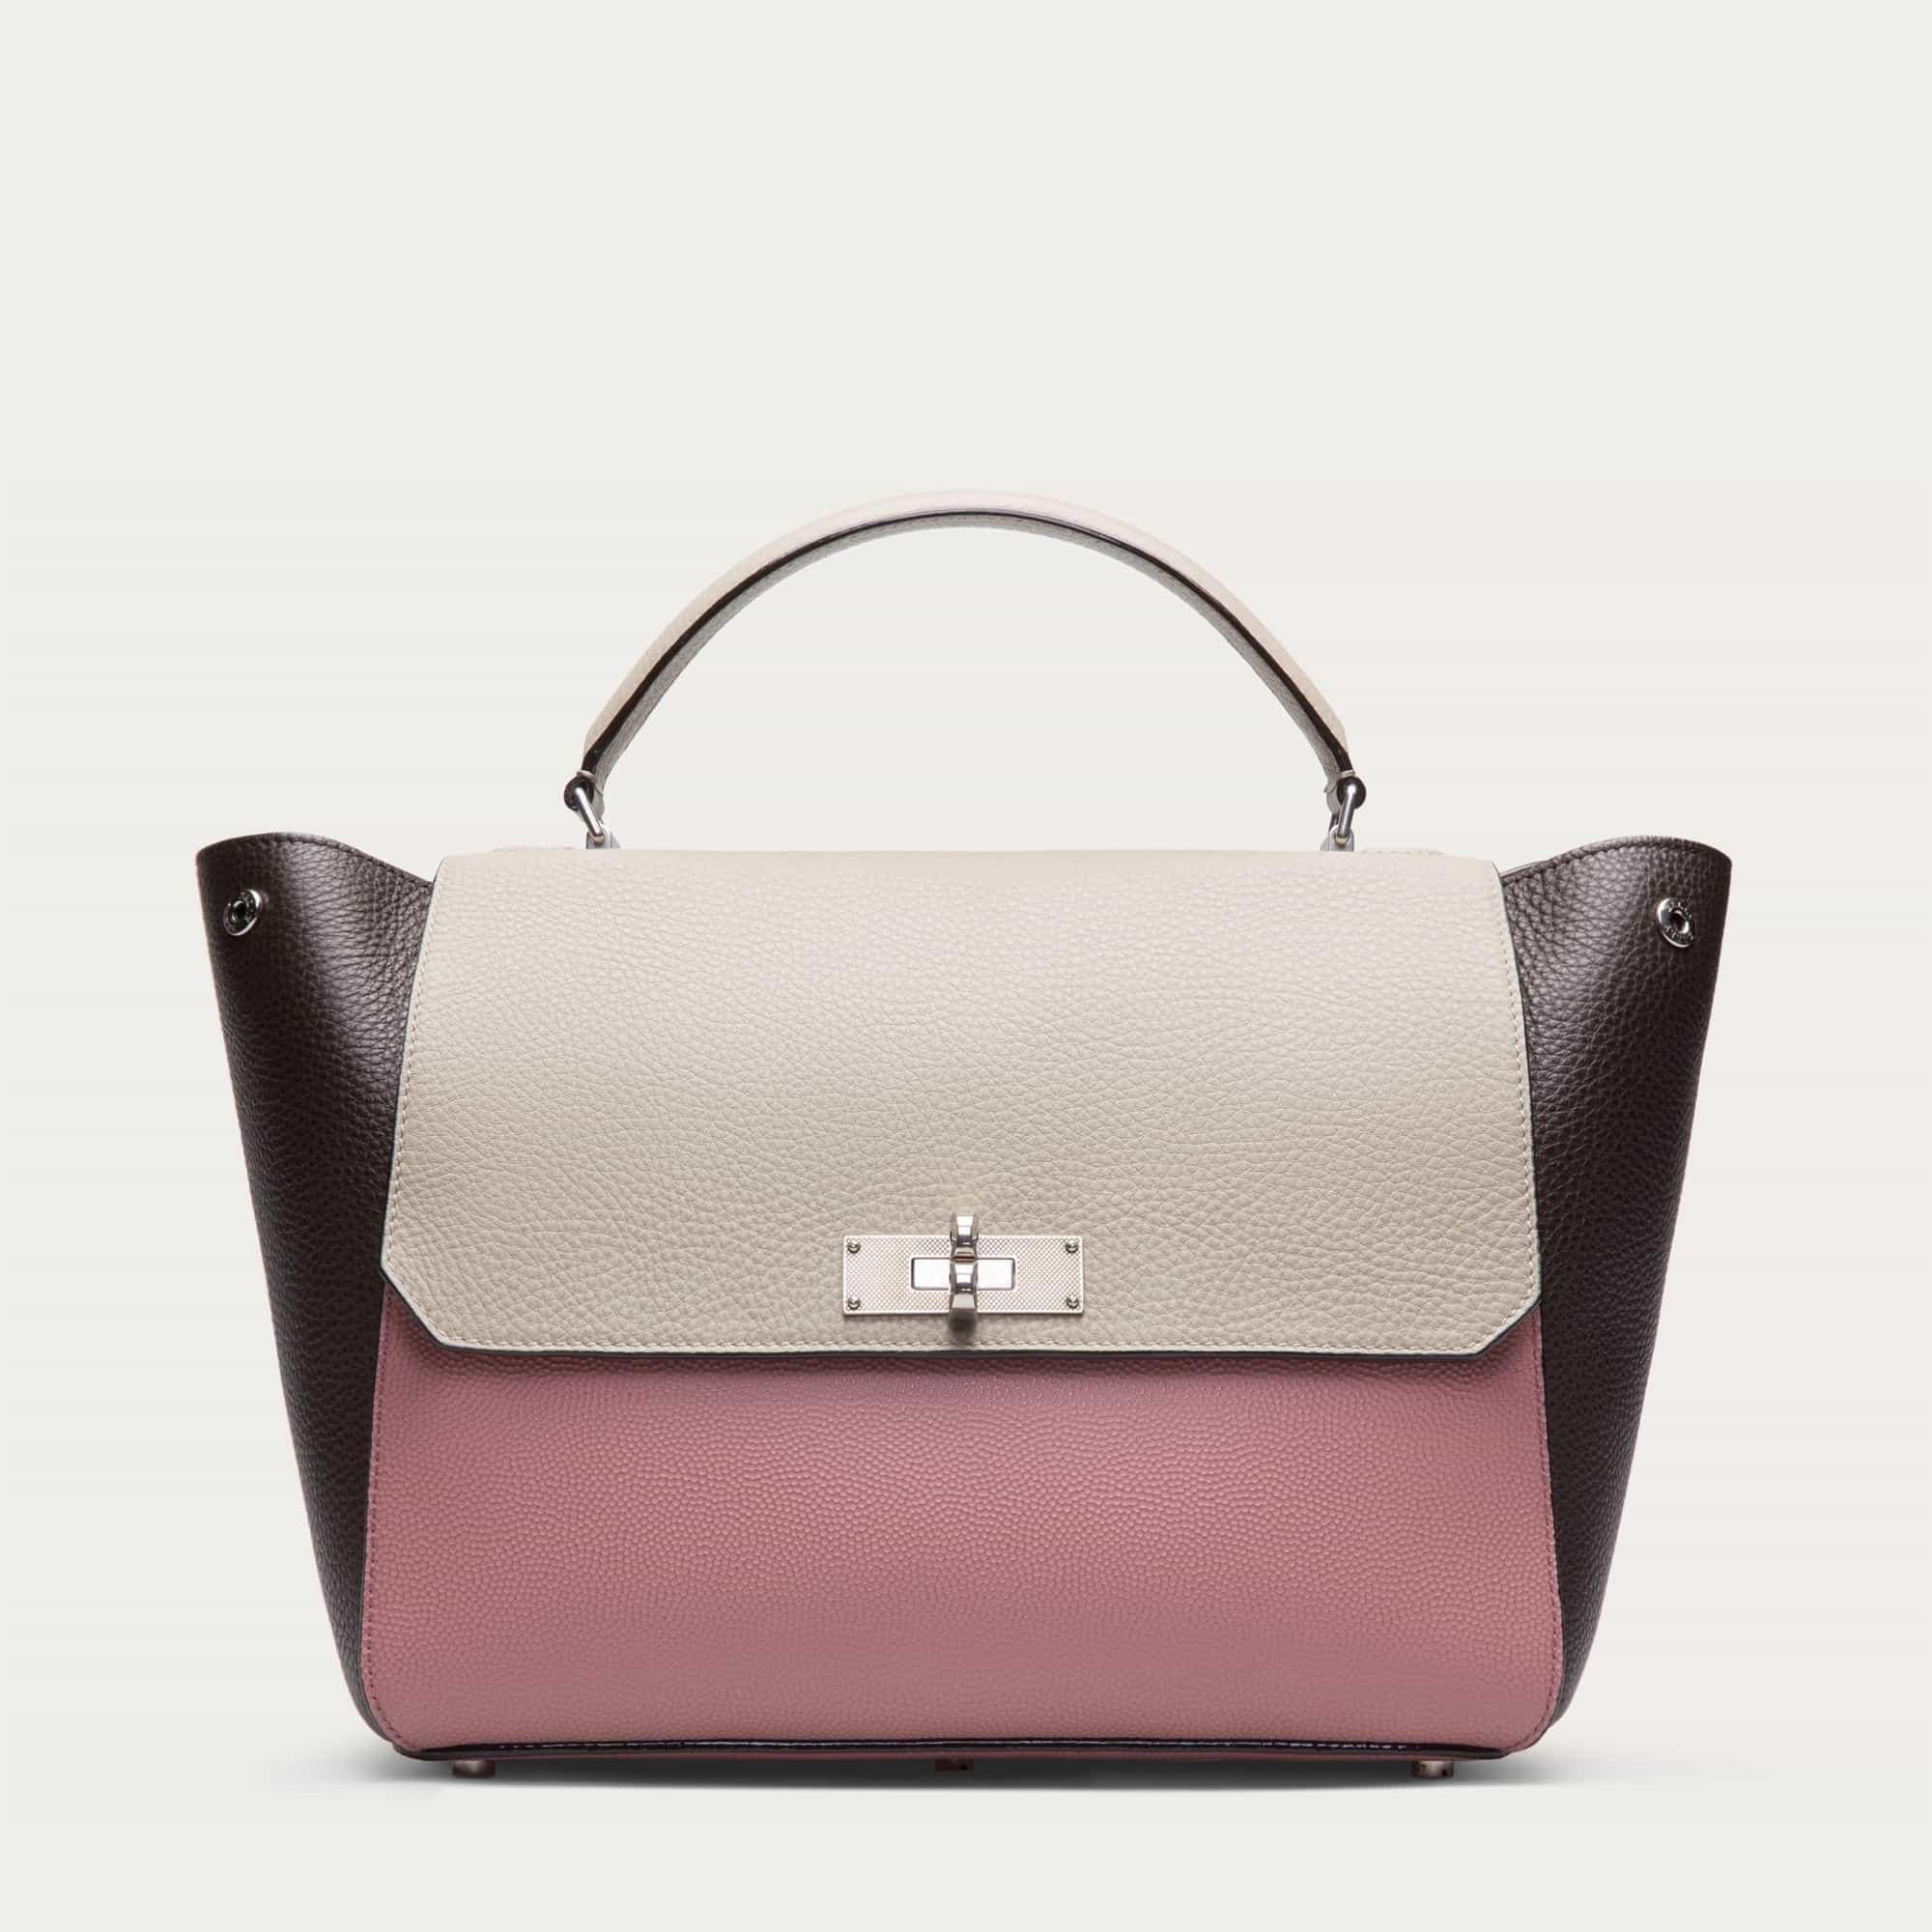 Bally Women B Turn Medium Leather Top Handle Bag Rosehaze   000000006203743001  f7fc77d449